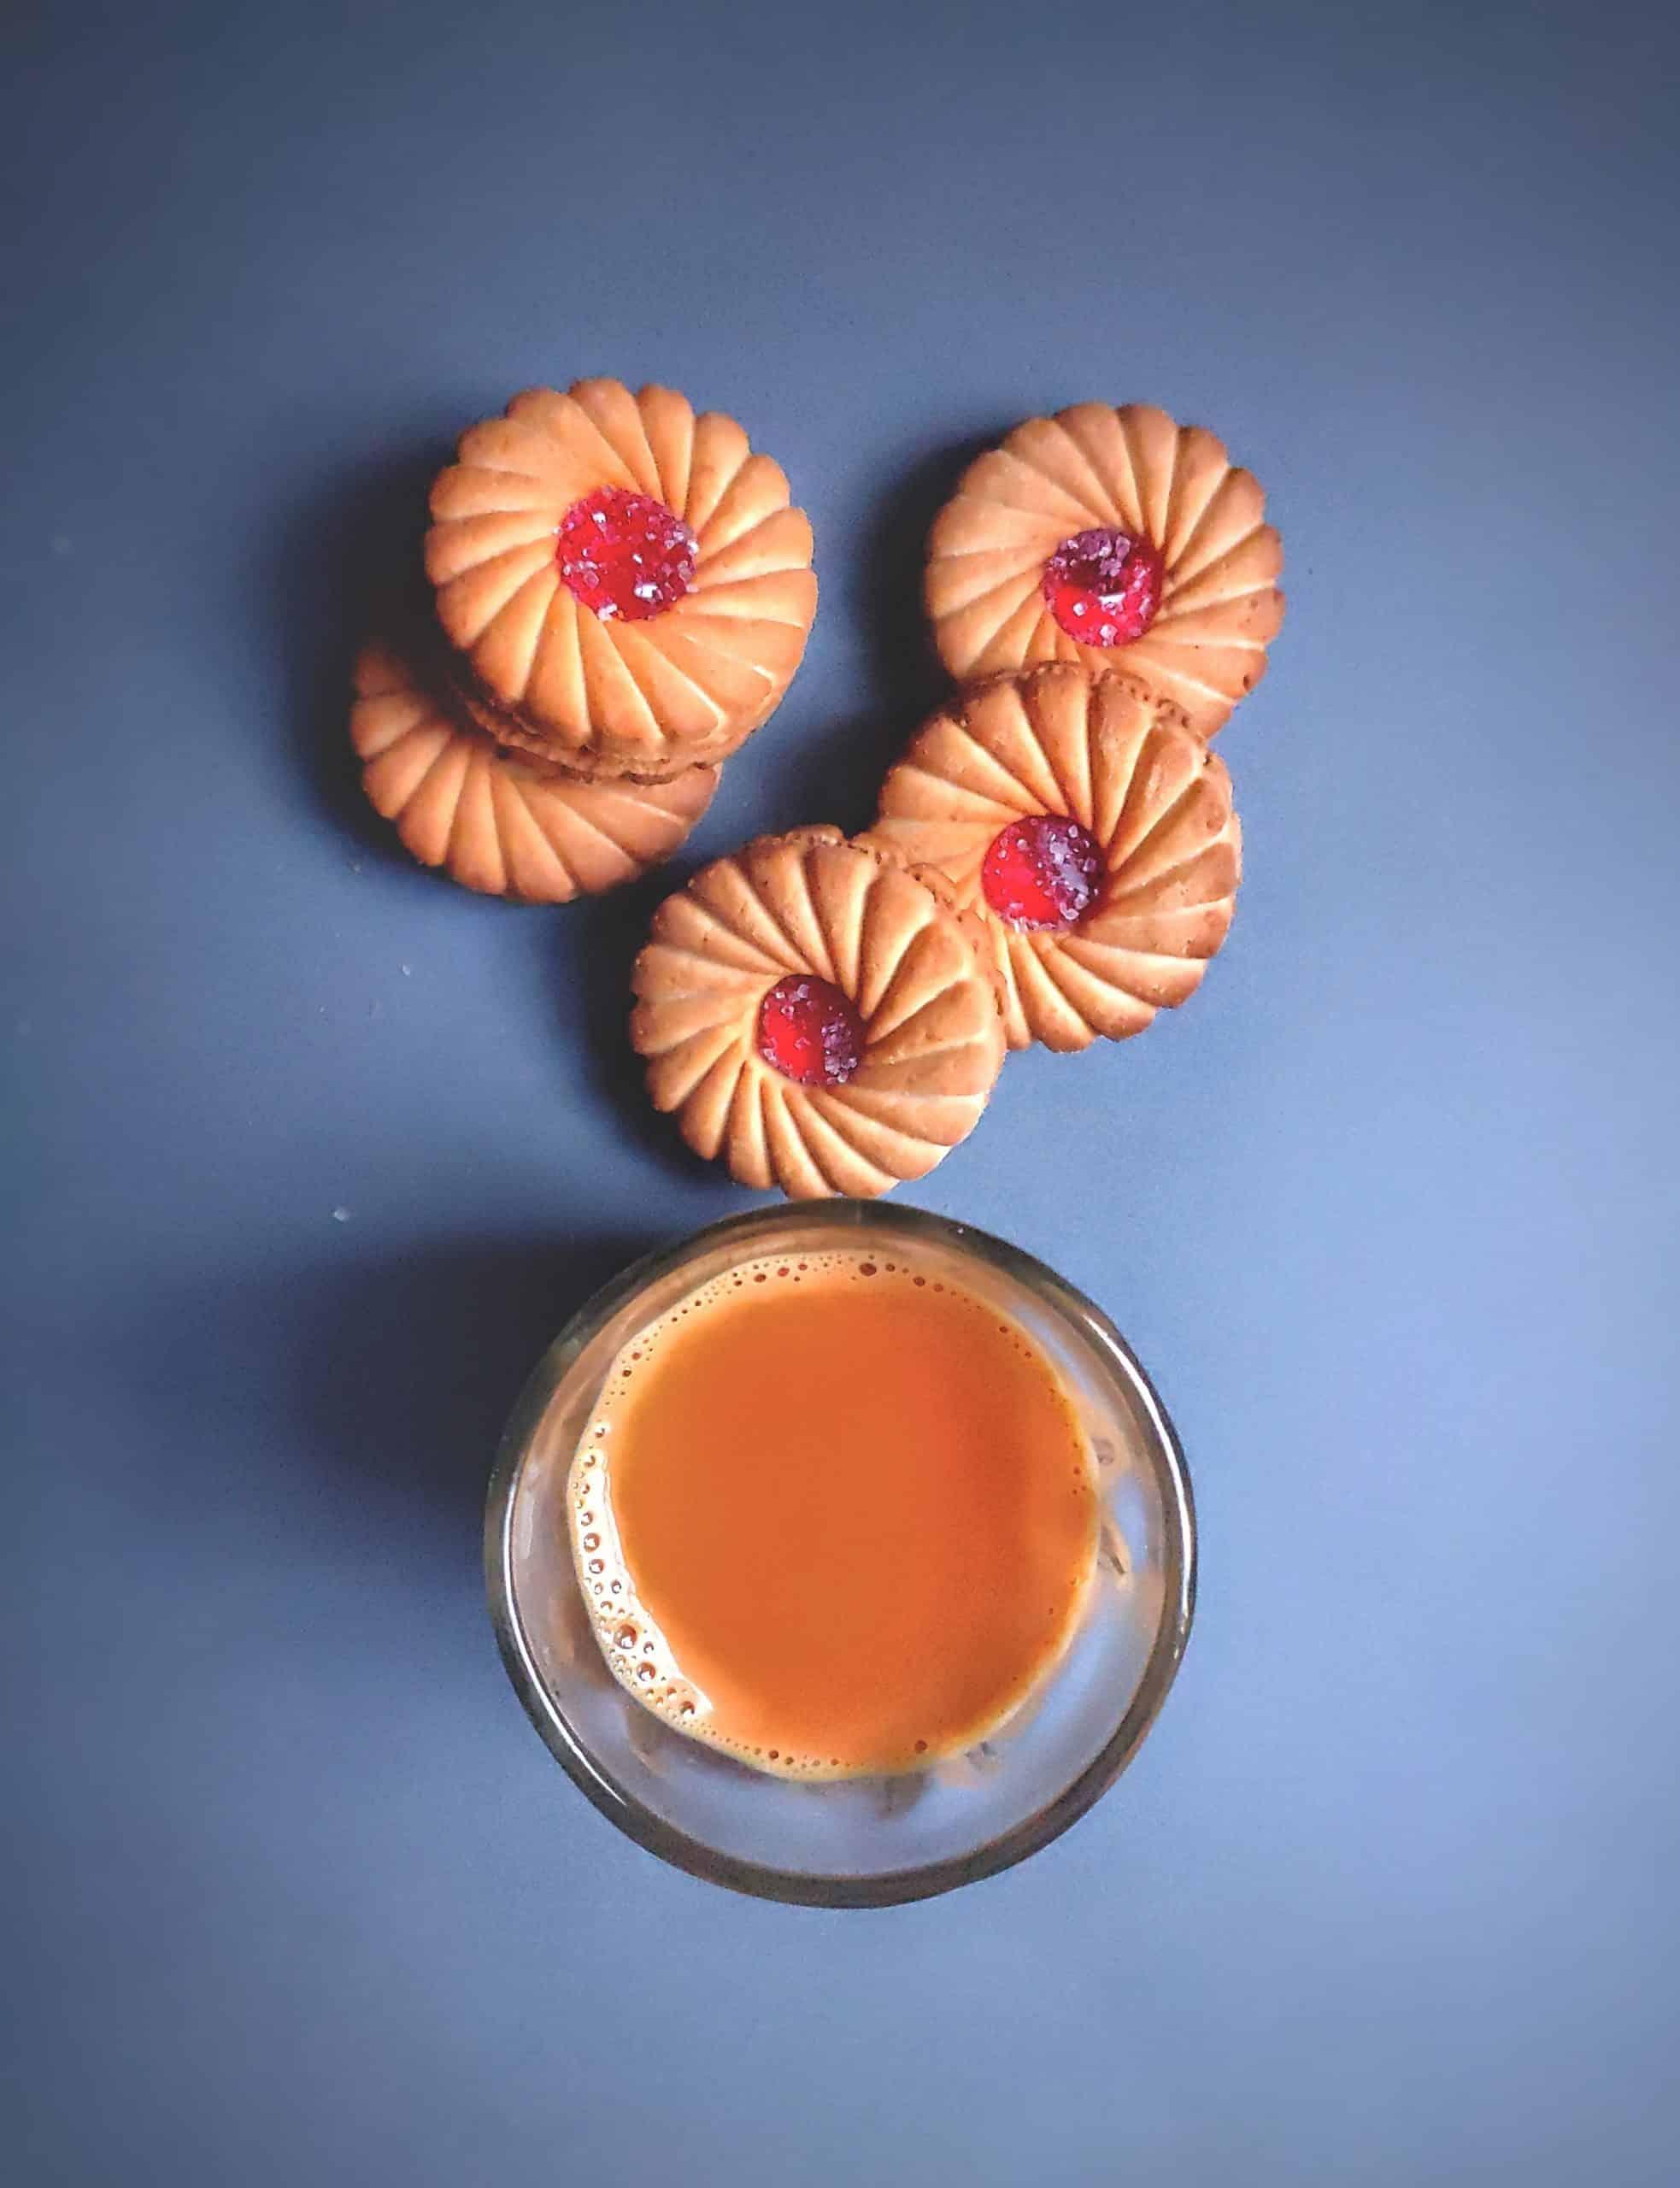 Cuban desserts, traditional Cuban desserts, Cuban sweets, Cuban confections, Cuba dessert, cuban deserts, Havana Cuban desserts, desserts in Cuba, Cuban dessert recipes, Cuban sweets #Cuba #desserts